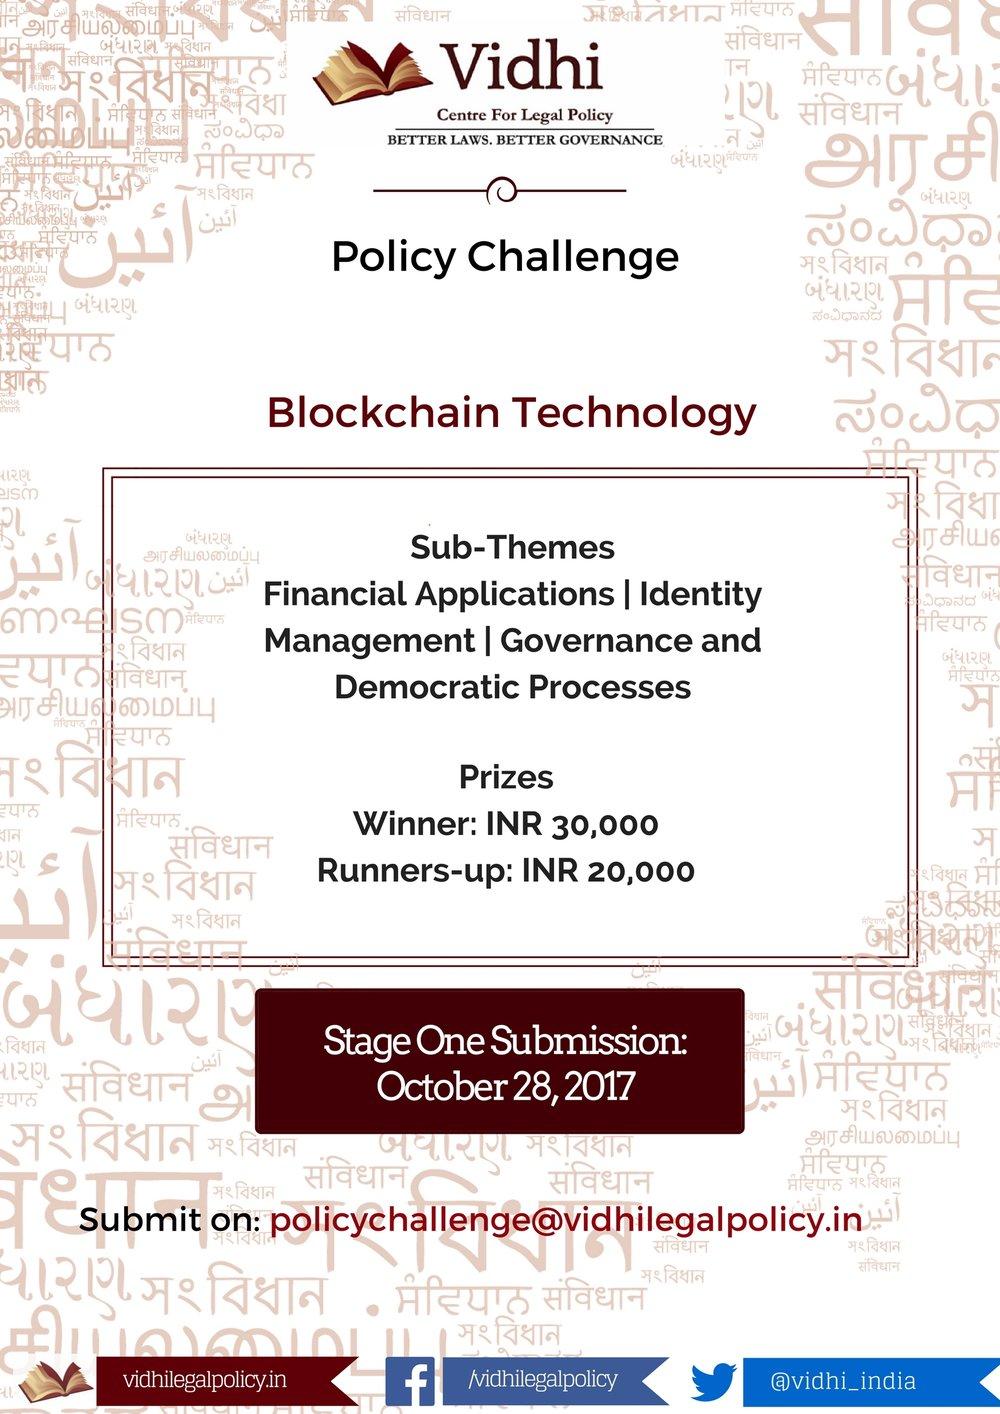 Vidhi Policy Challenge 1